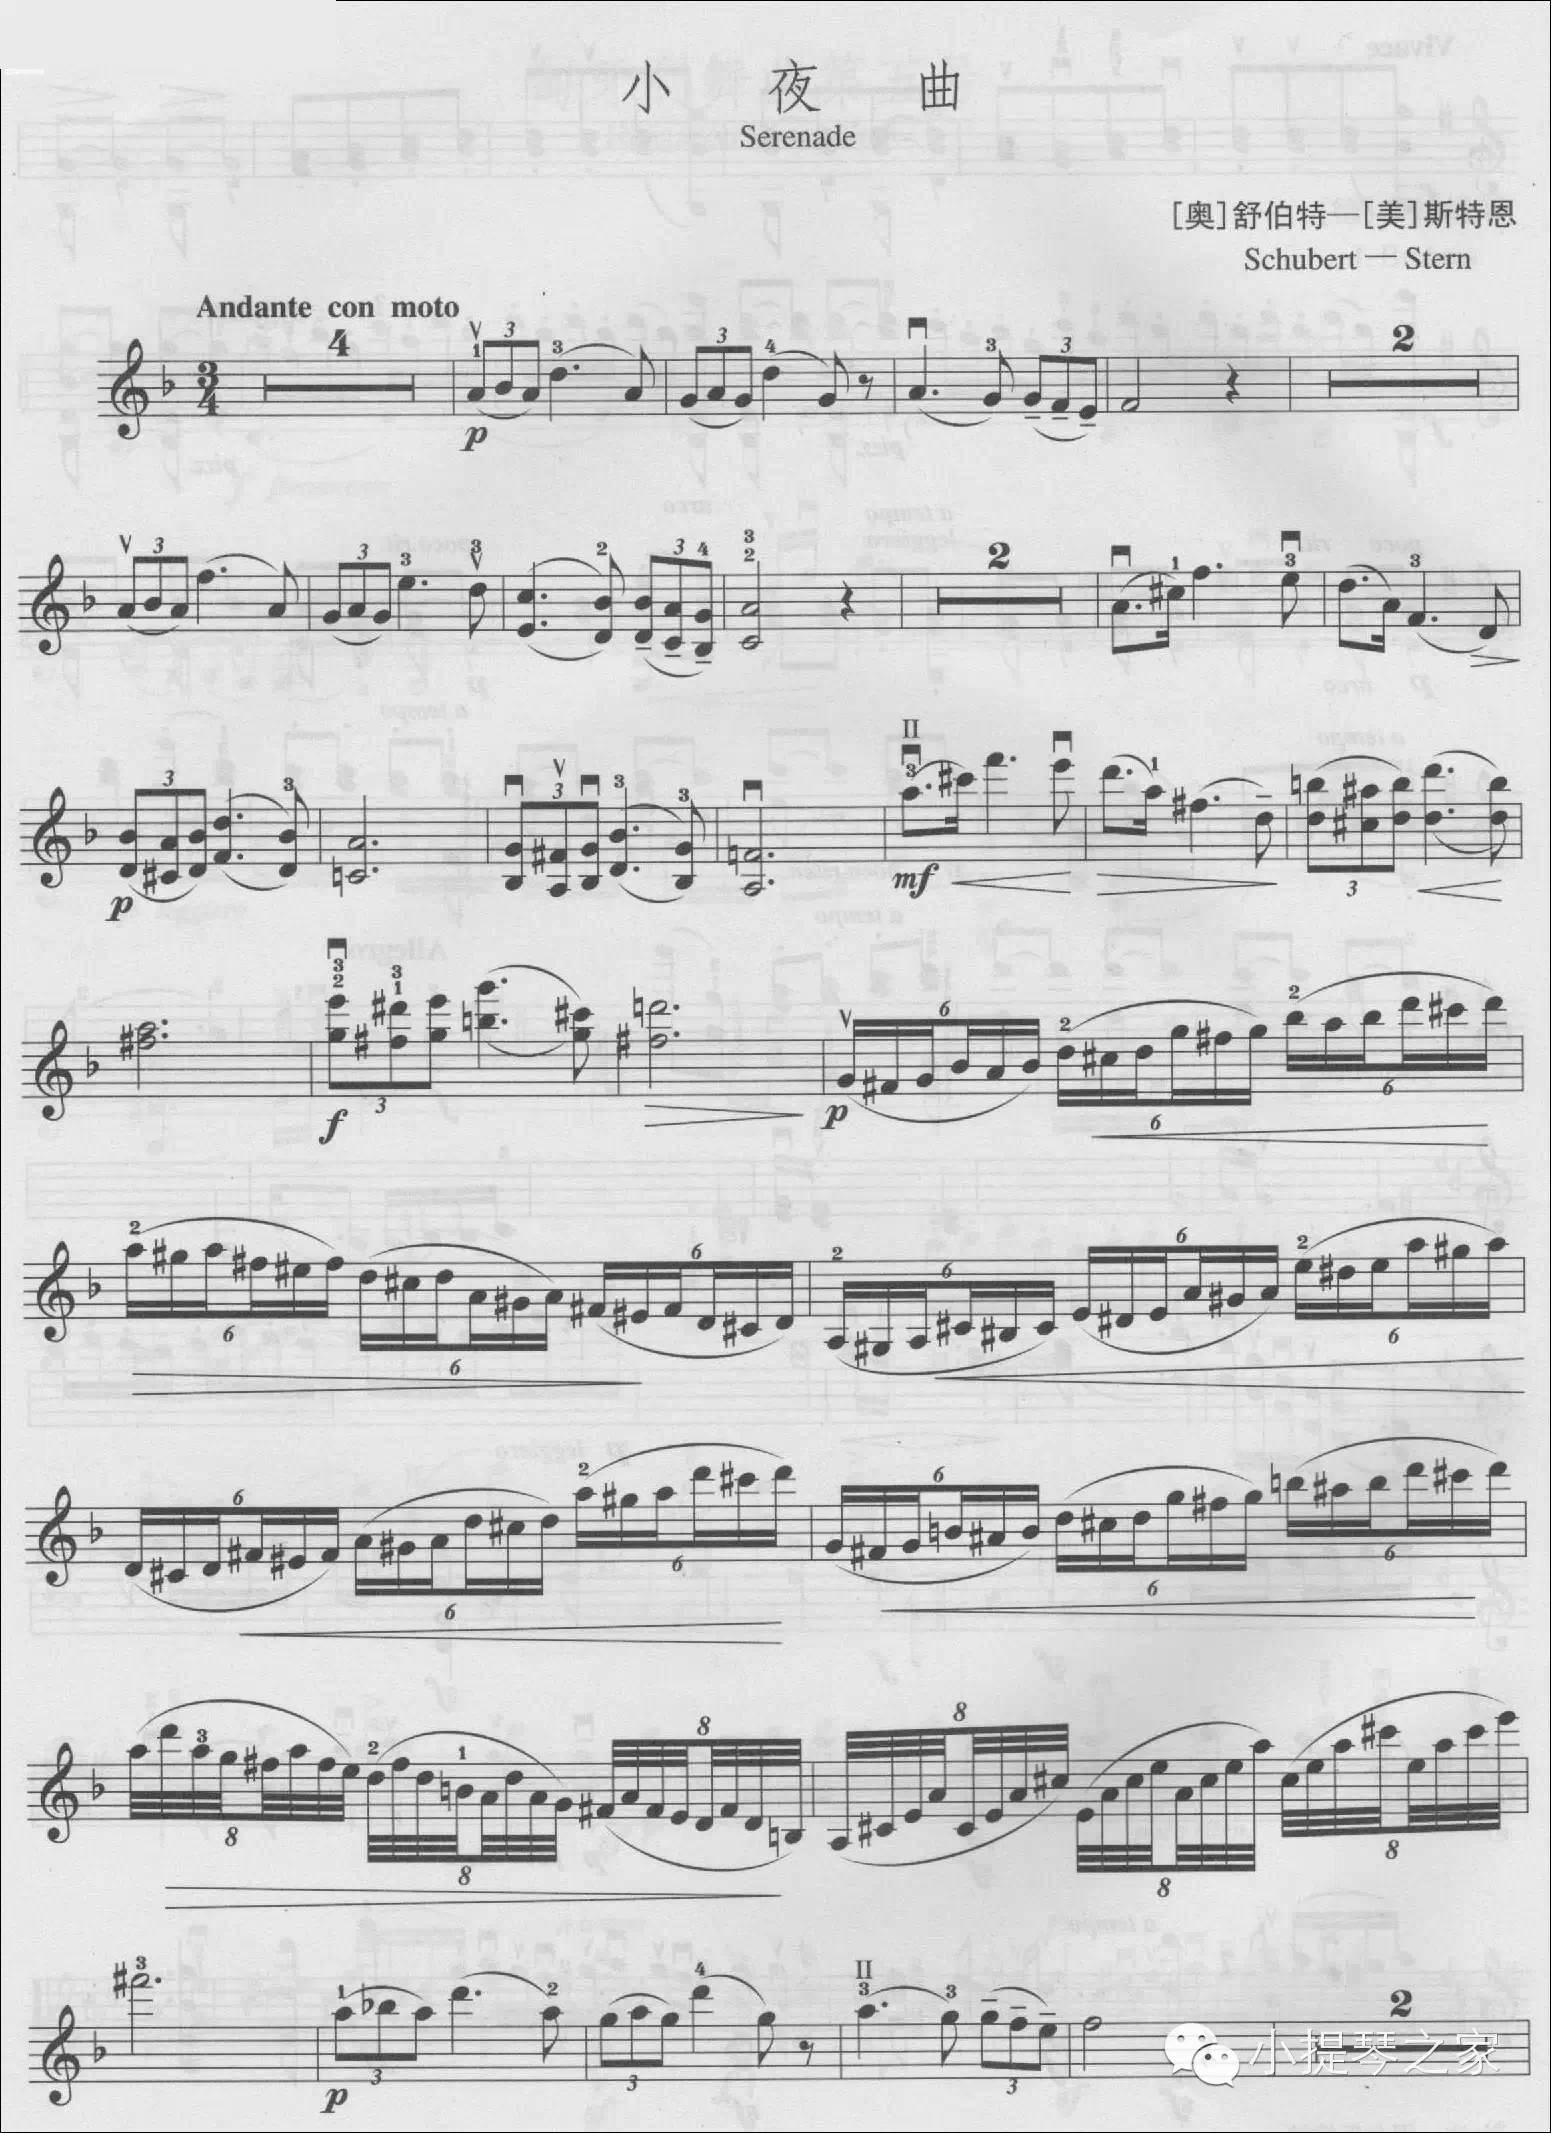 小提琴:《小夜曲(serenade)》附乐谱-舒伯特